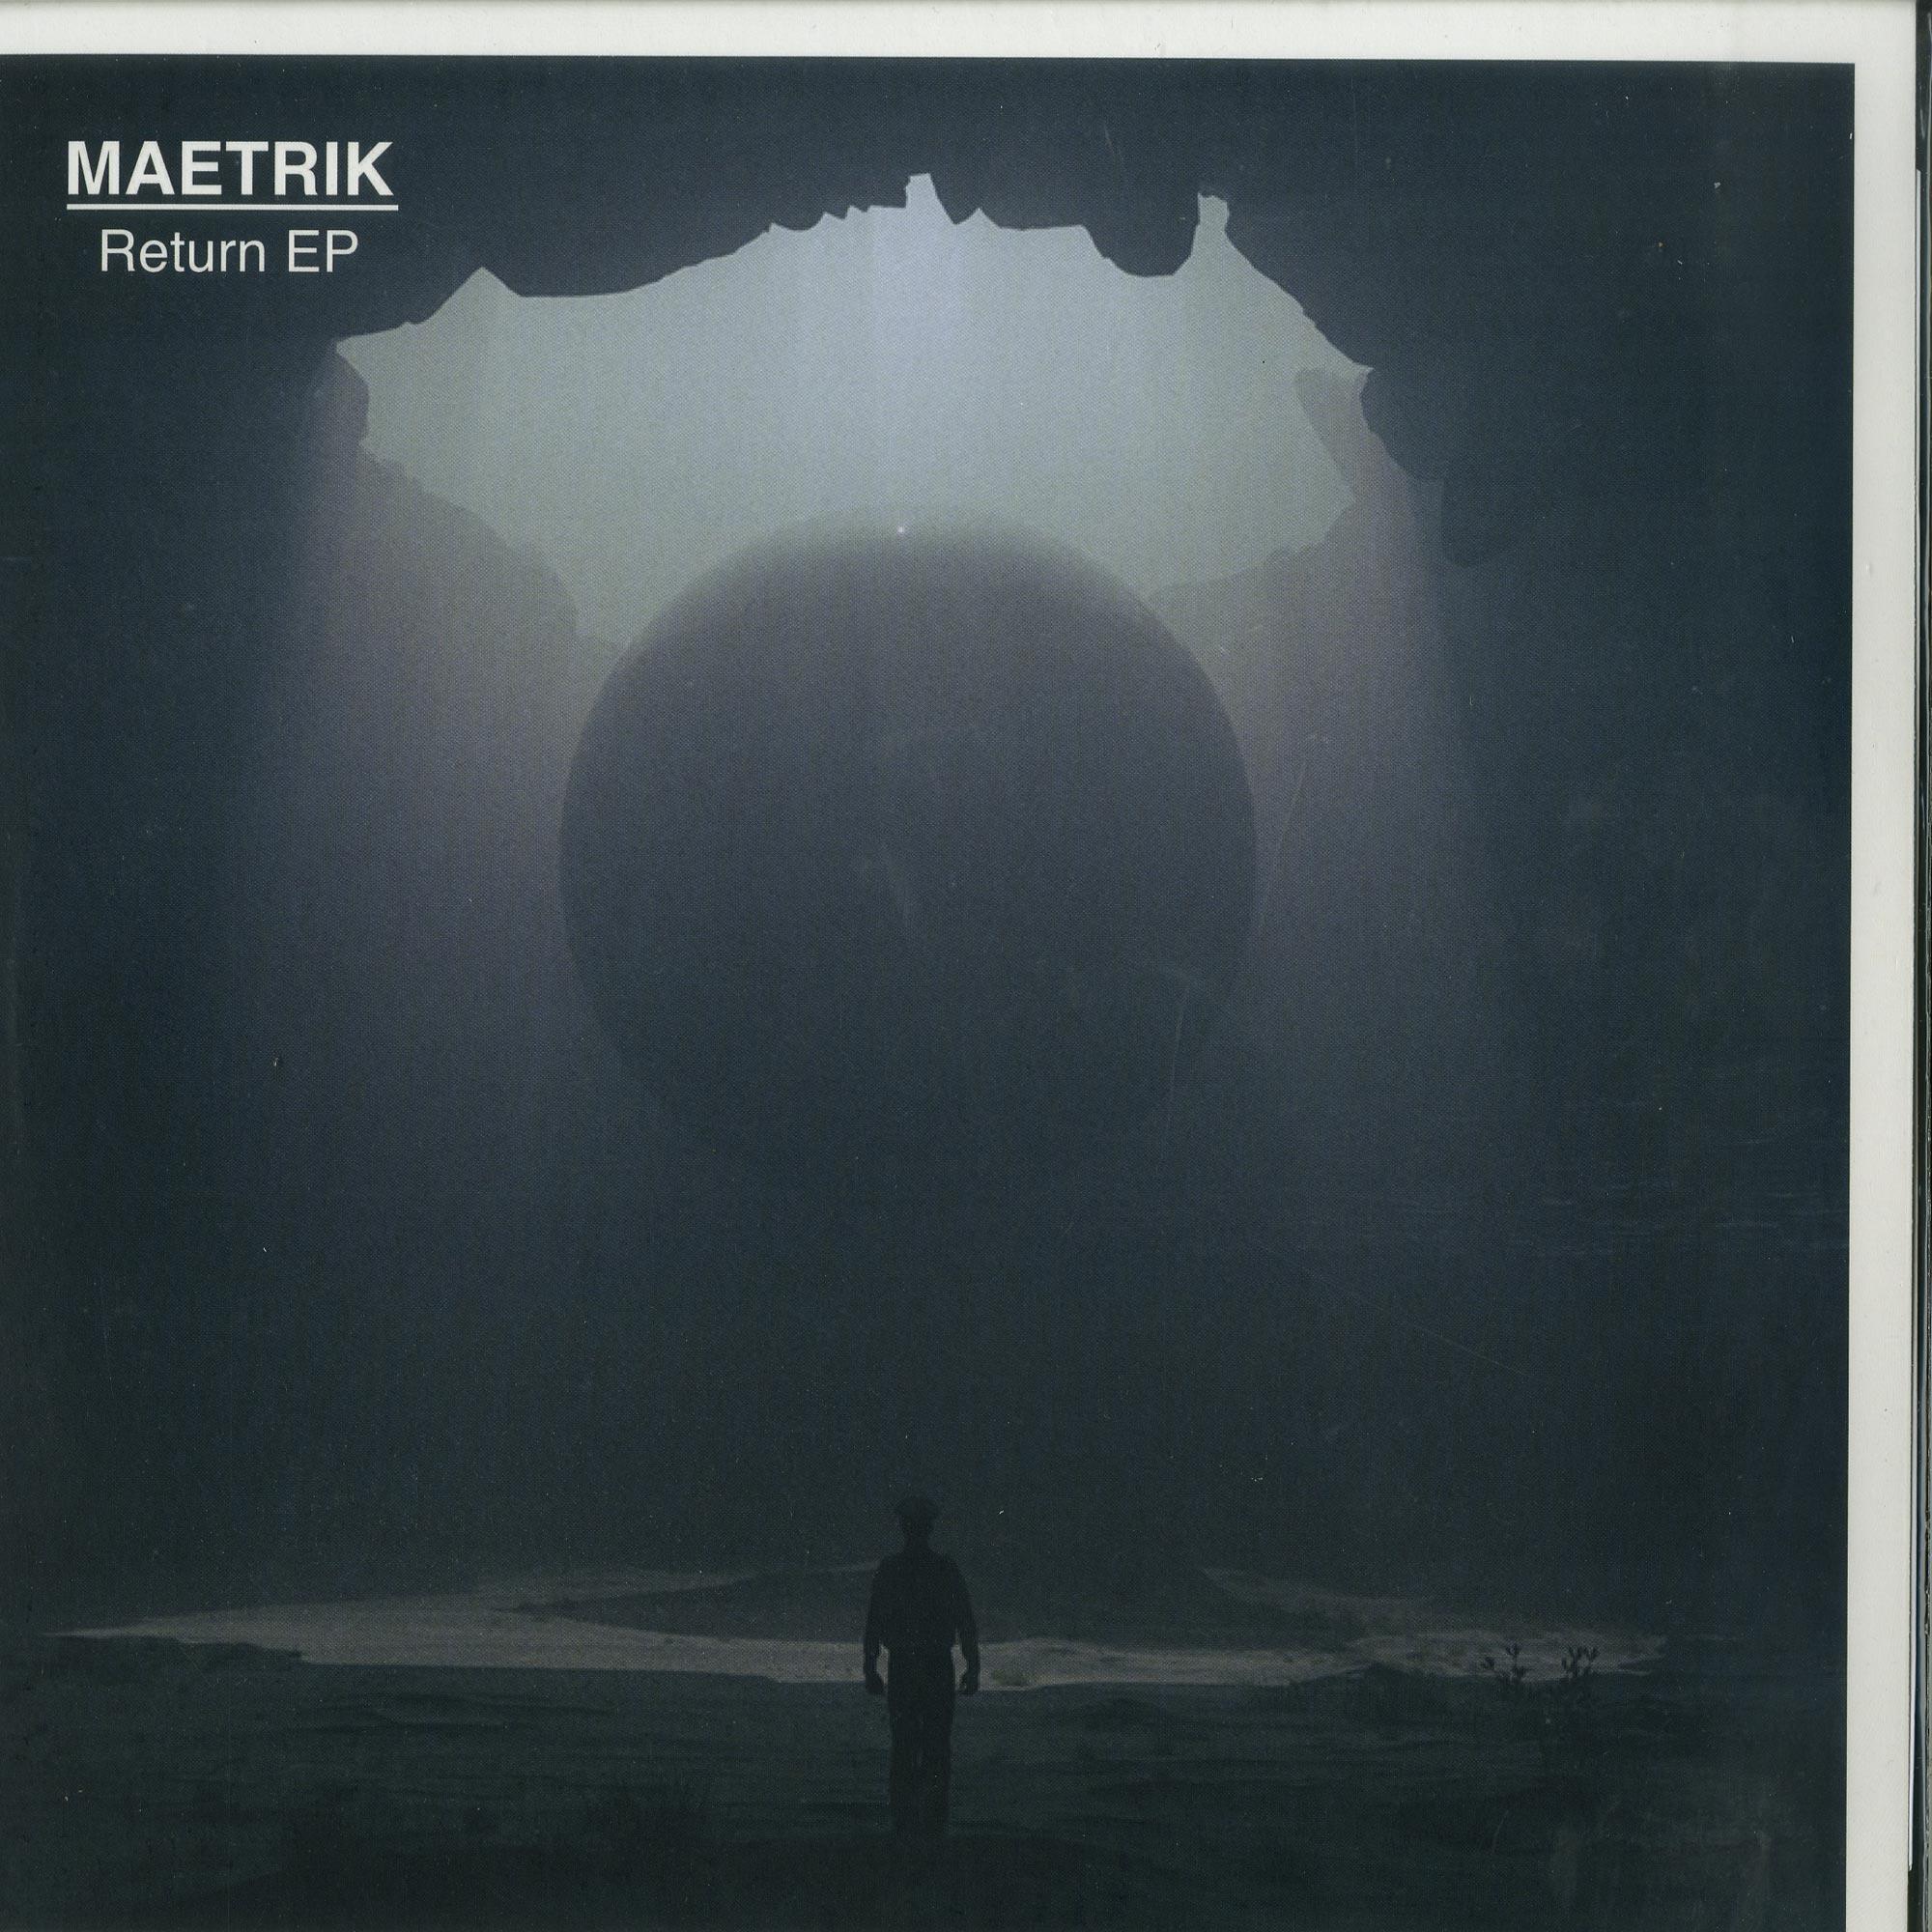 Maetrik - THE RETURN EP